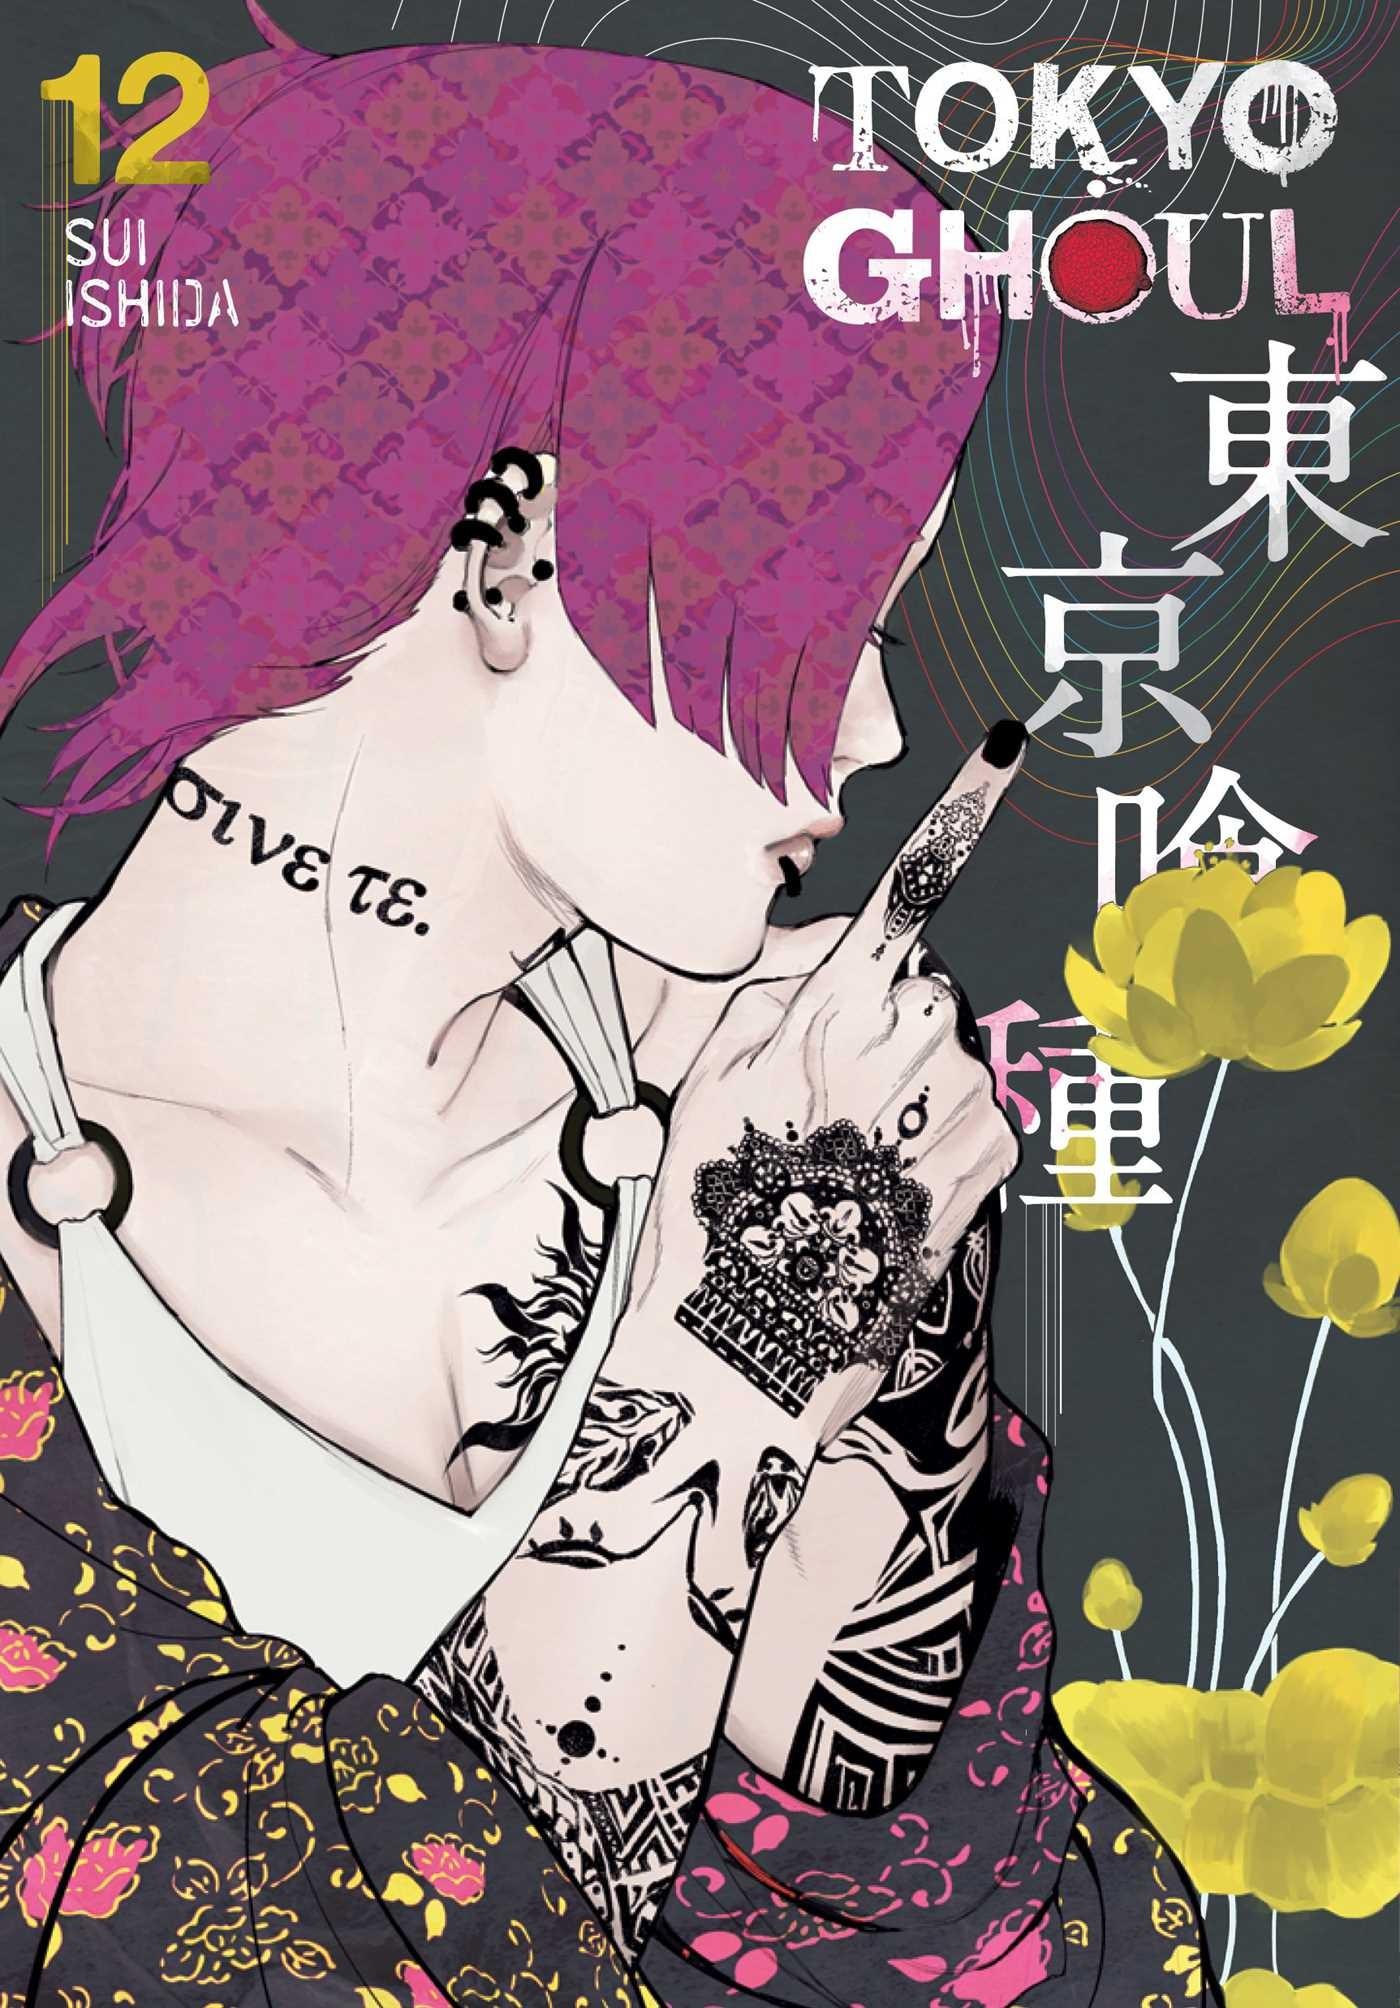 Tokyo Ghoul, Vol. 12 by Sui Ishida